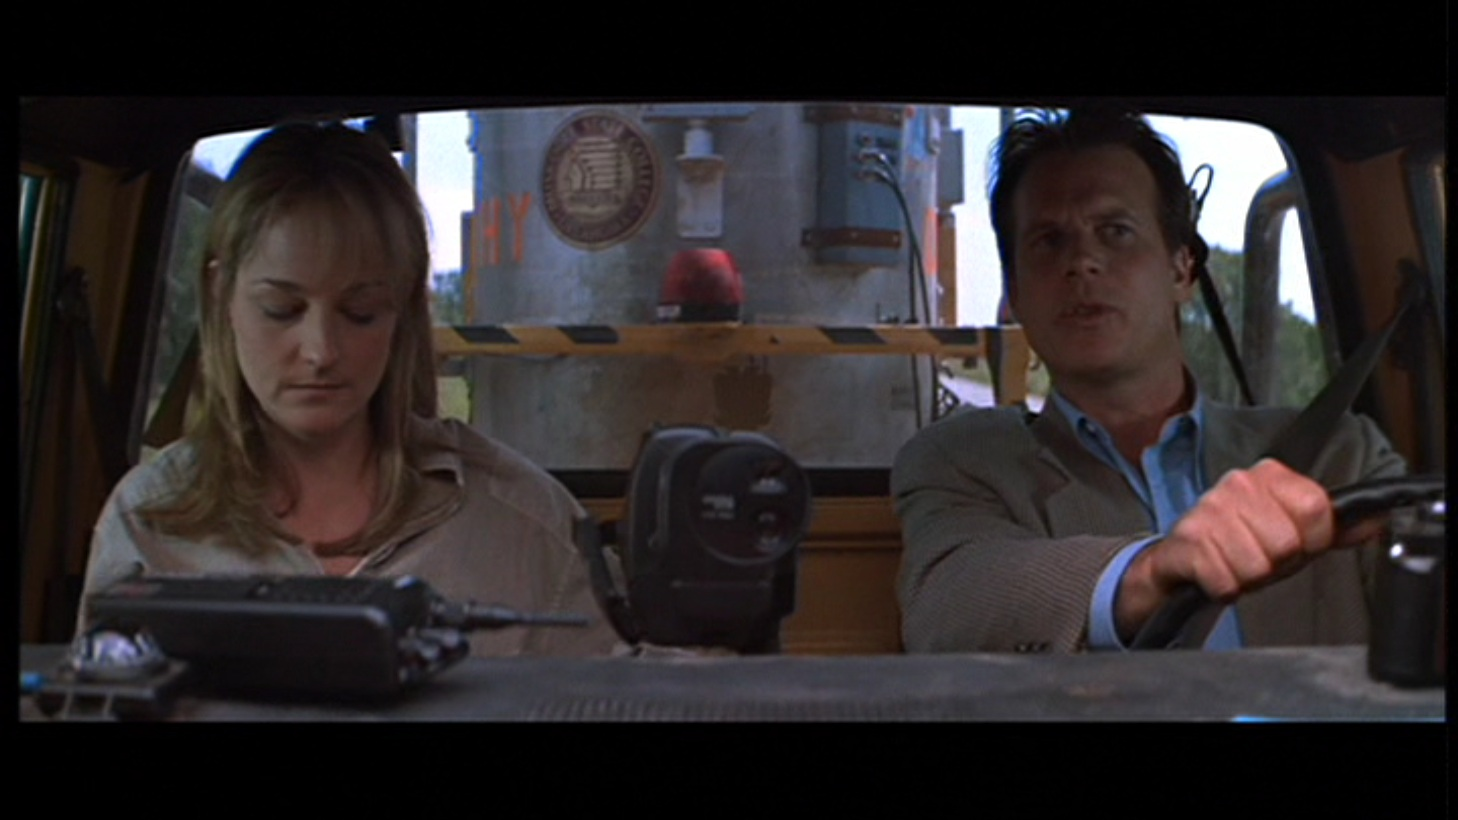 http://2.bp.blogspot.com/-Dyjha44MlaQ/Tm7PTbuc0YI/AAAAAAAAKcM/PWVogZGHxa8/s1600/Twister%2B5.jpg